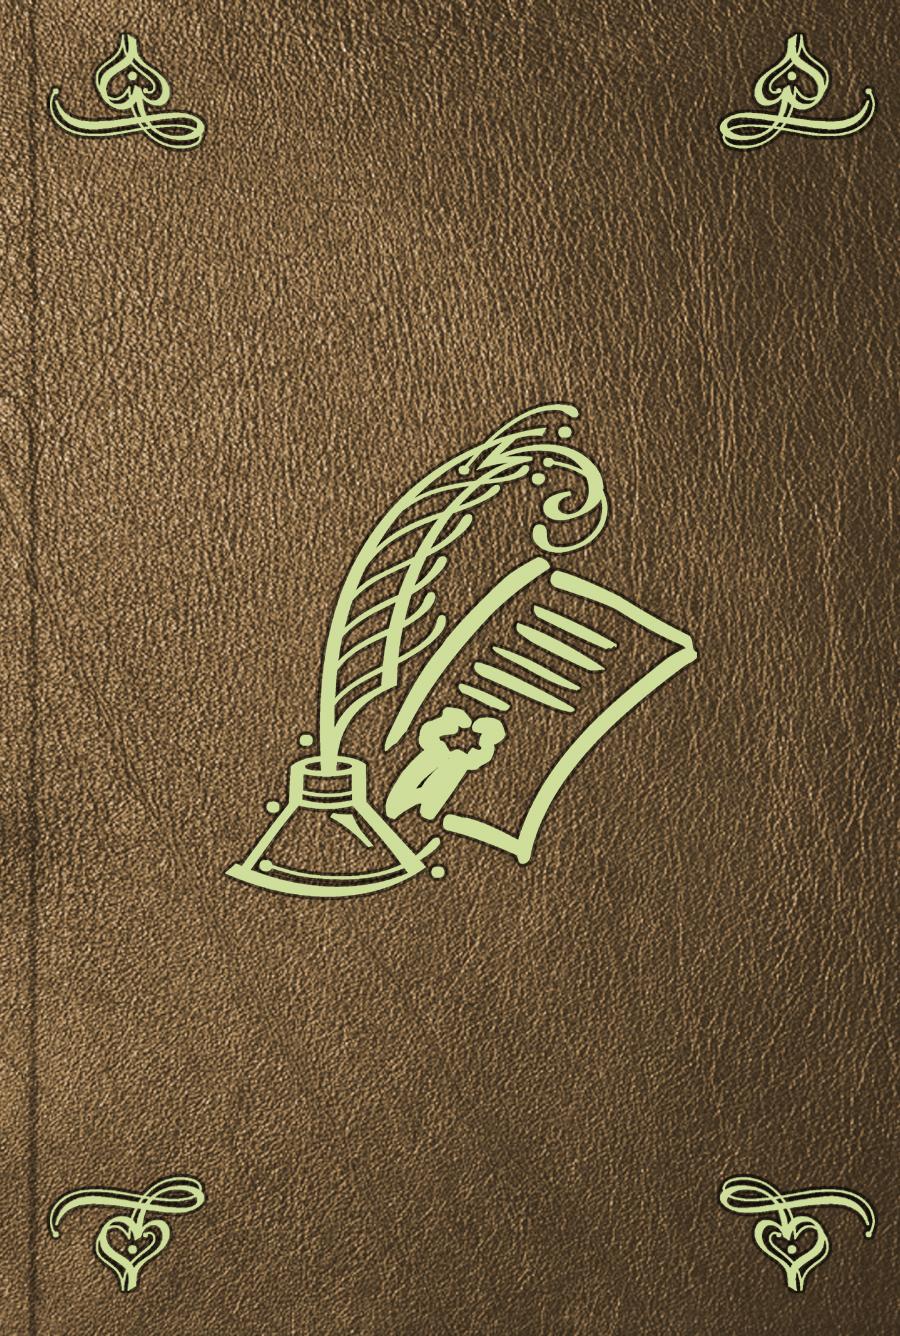 Arthur Collins The Peerage of England. Vol. 5 henry fritz gilbert genealogical gleanings in england waters the new england historical and genealogical register 1877